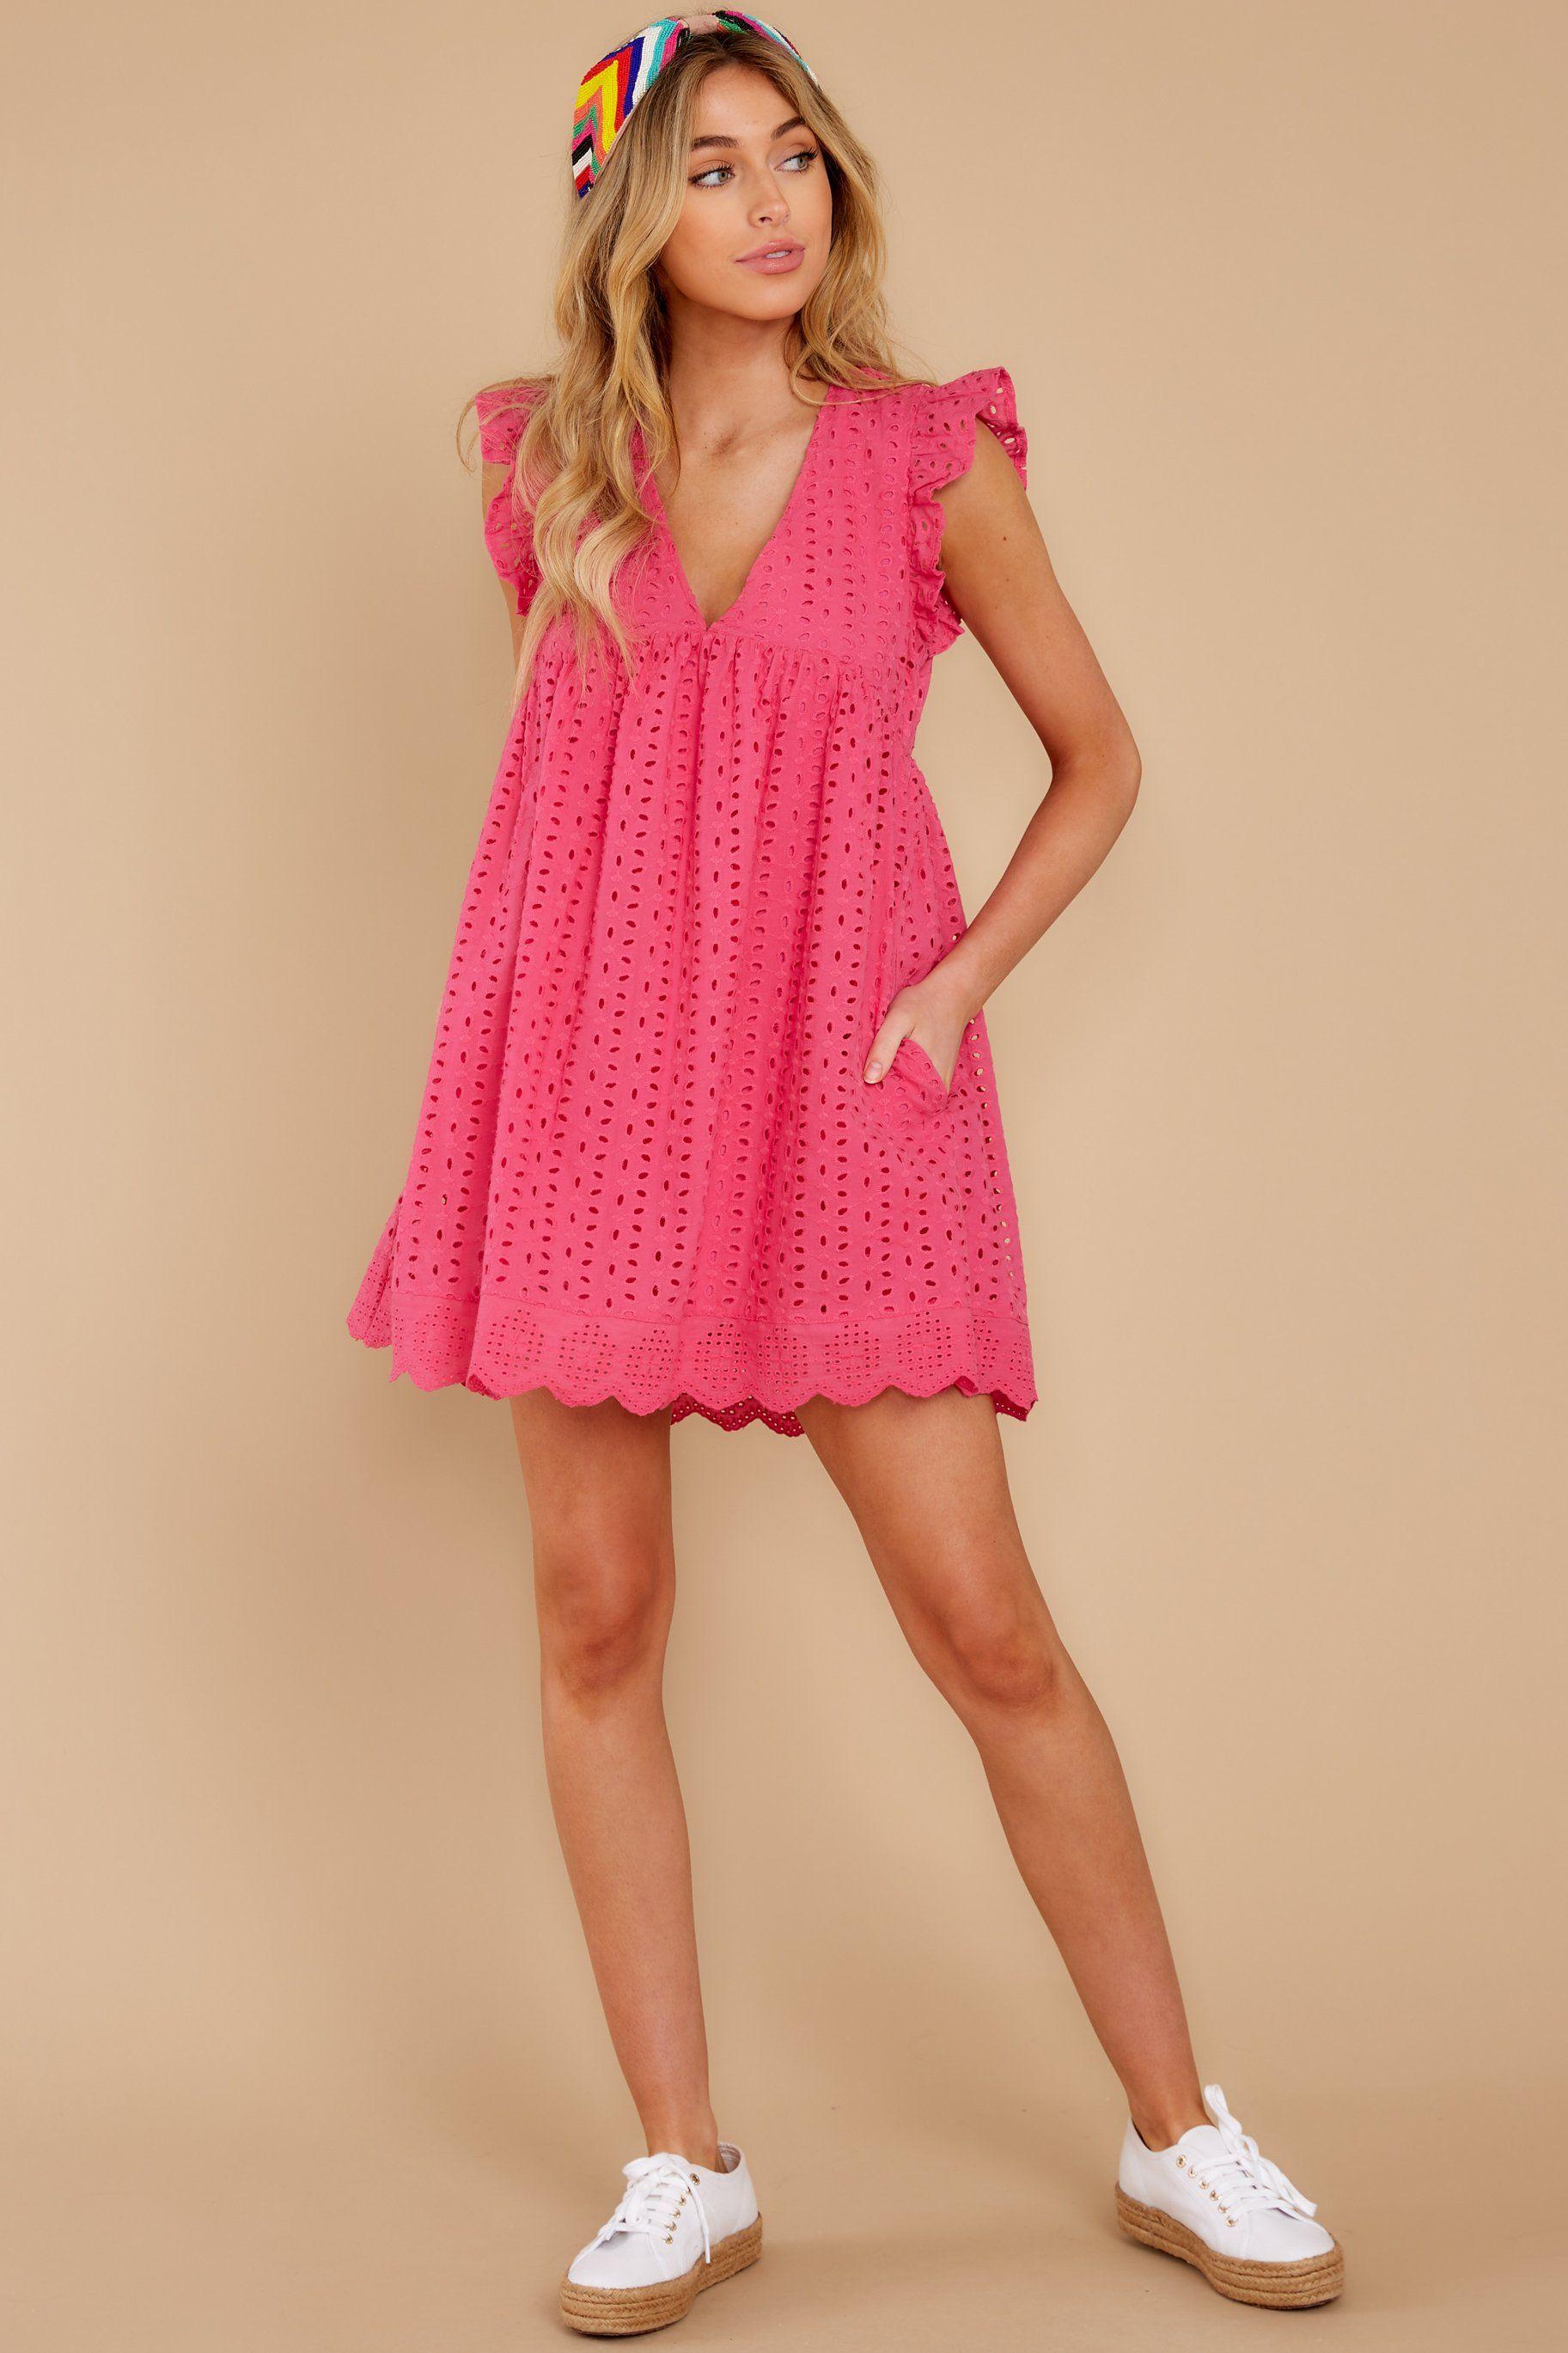 Flirty Pink Romper Eyelet Dress Hidden Romper Playsuit 48 00 Hot Pink Romper Red Dress Boutique Pink Rompers [ 2738 x 1825 Pixel ]